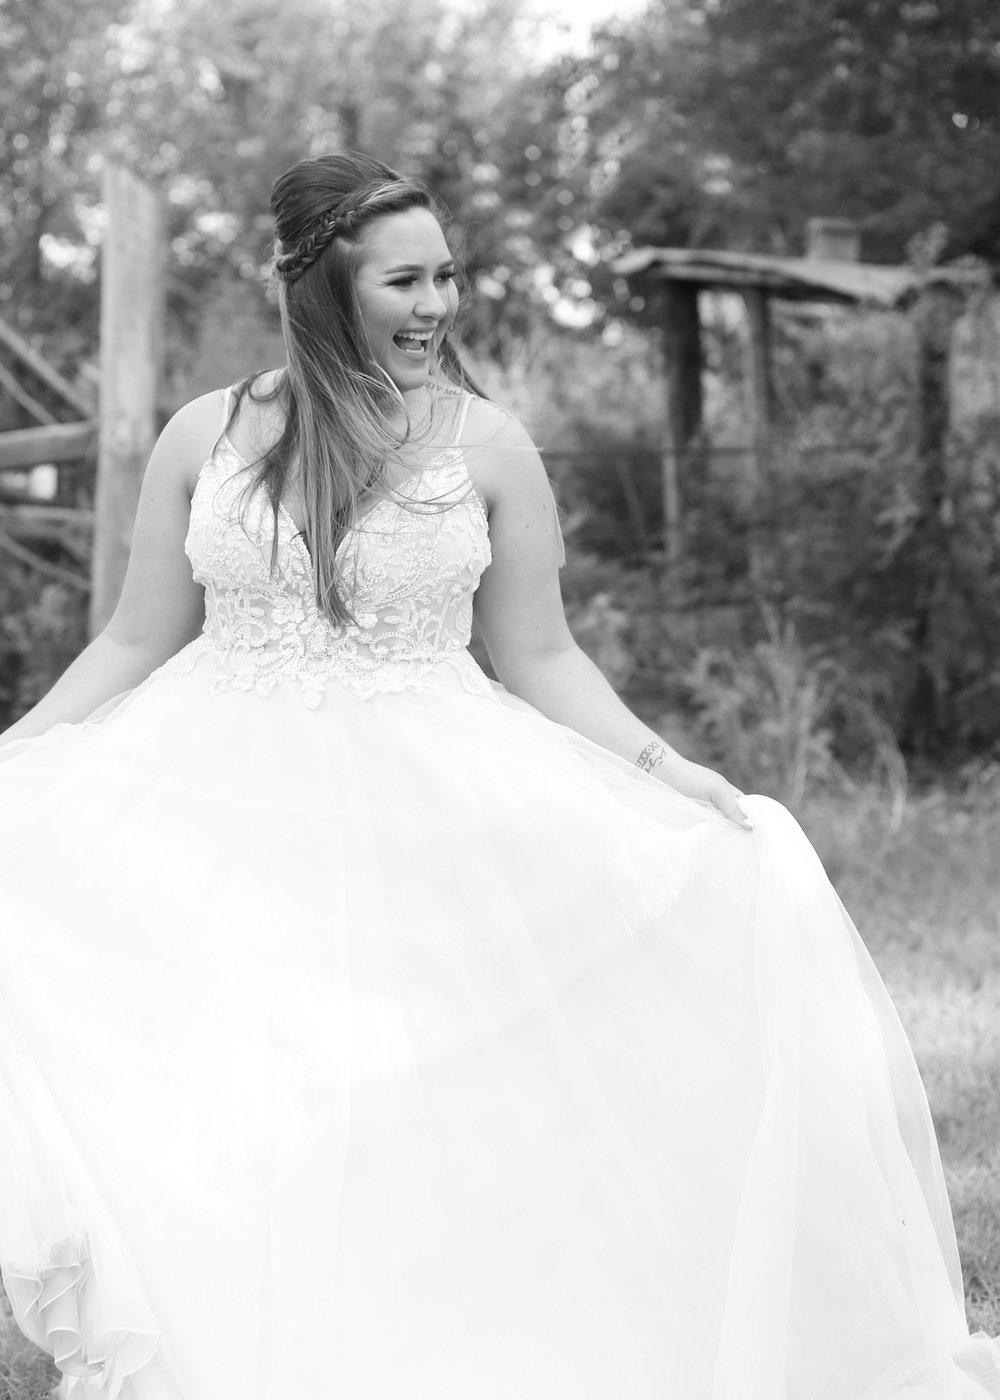 chey bridals-chey bridals-0024.jpg